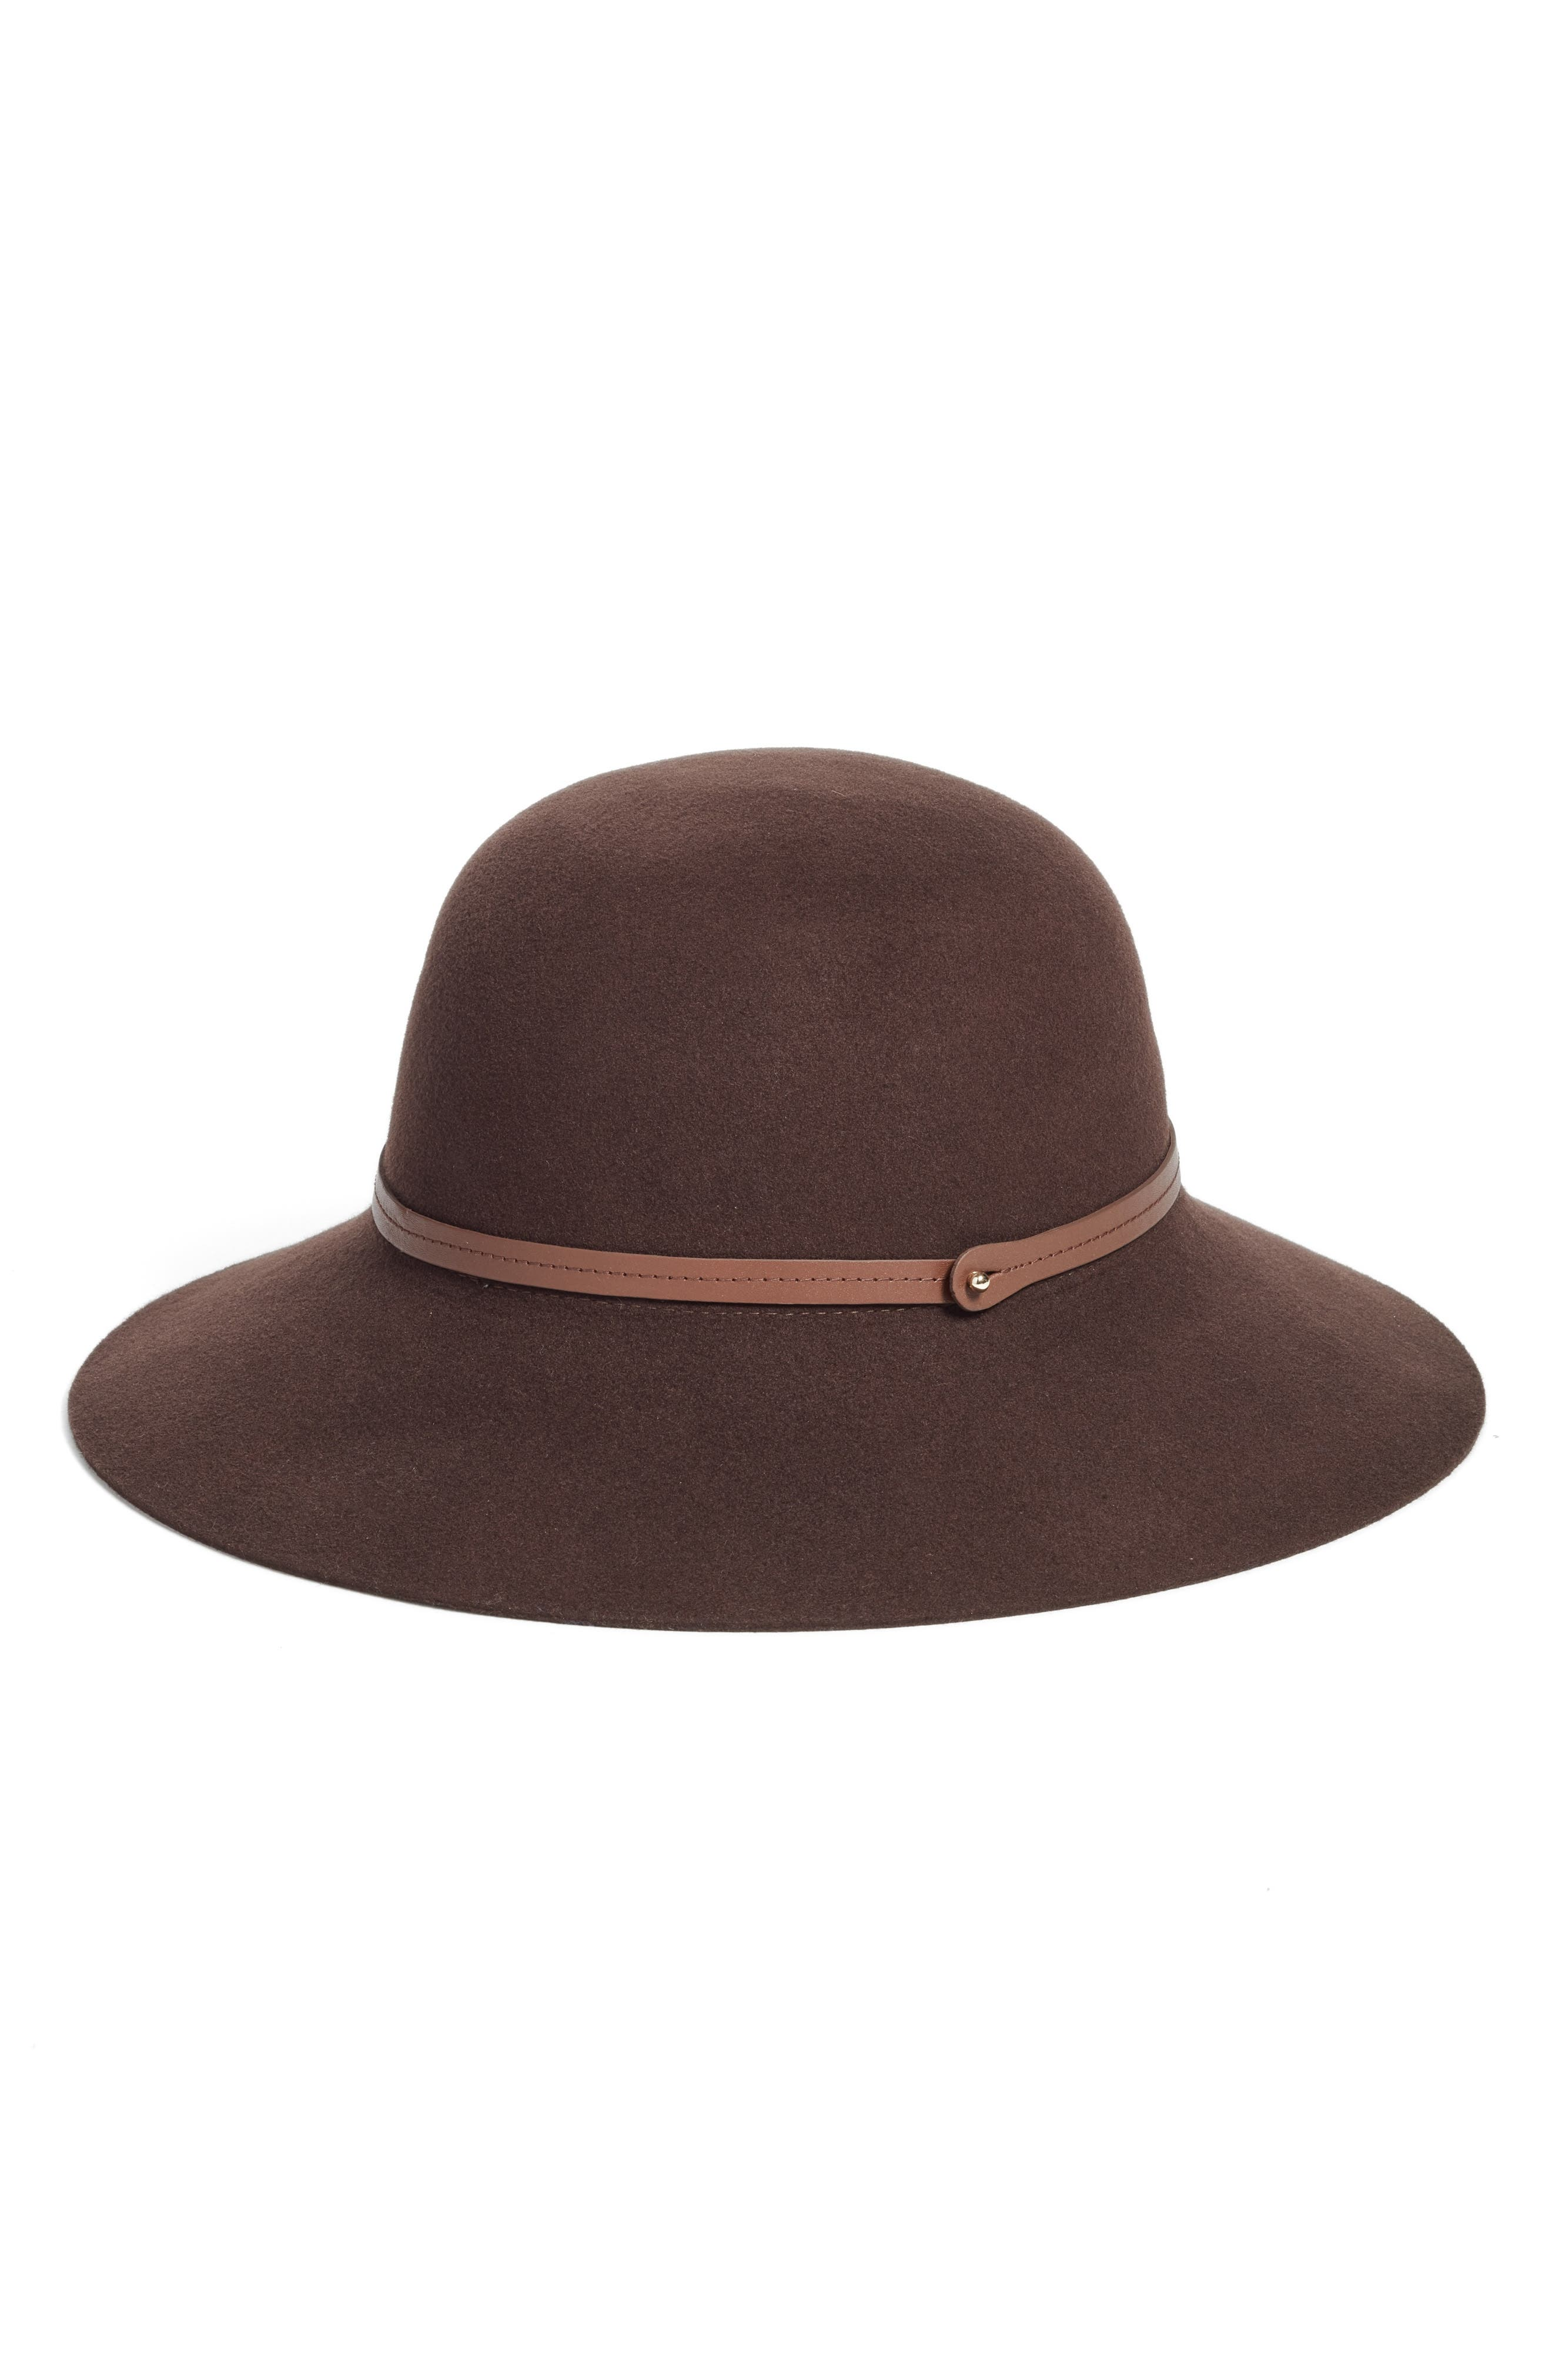 Angled Brim Wool Felt Hat,                             Alternate thumbnail 2, color,                             200